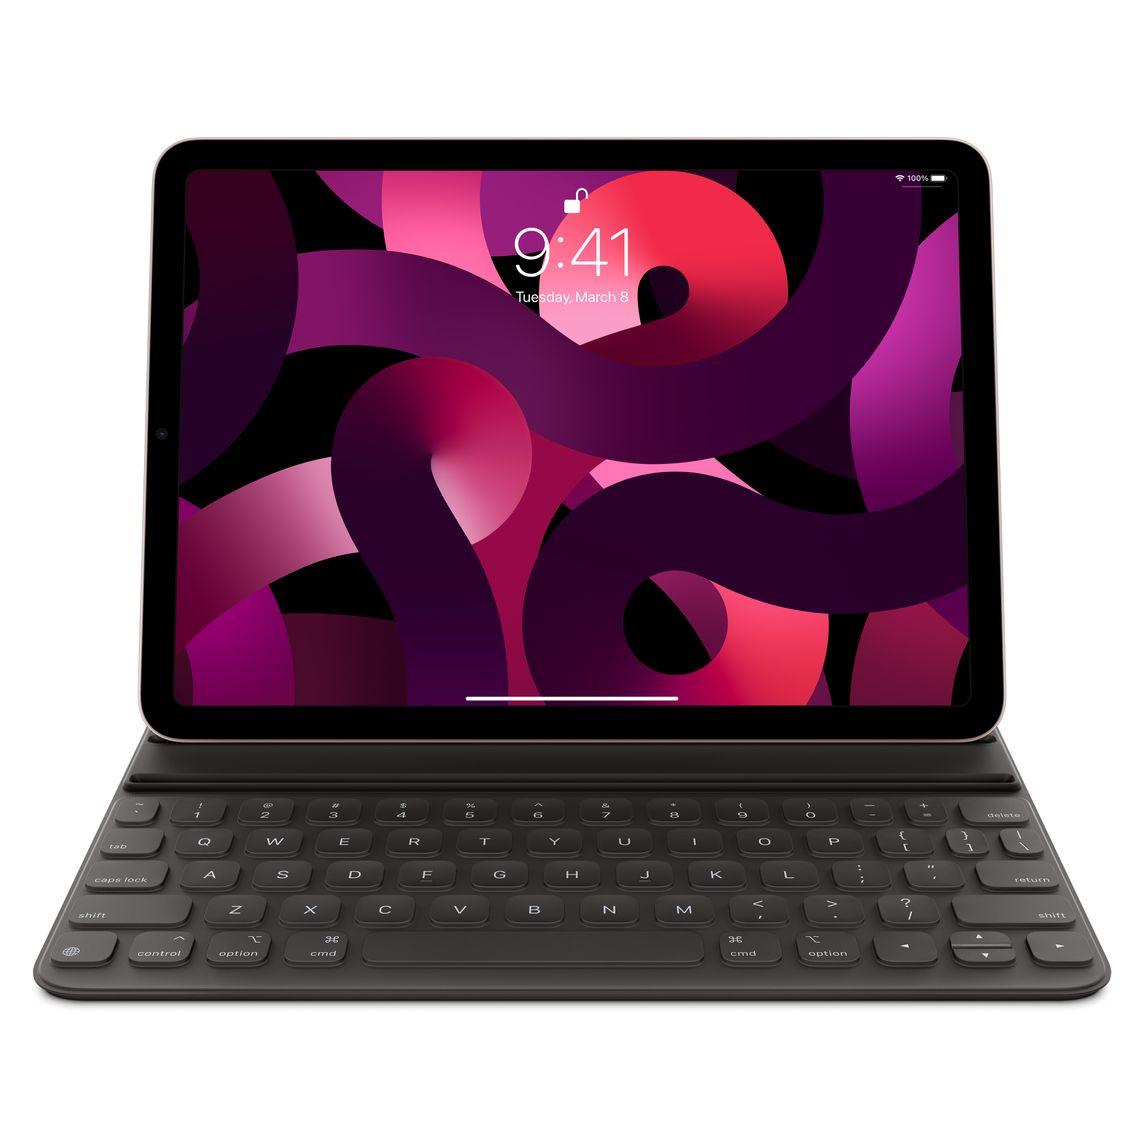 Smart Keyboard Folio For Ipad Pro 11 Inch 2nd Generation Us English Apple